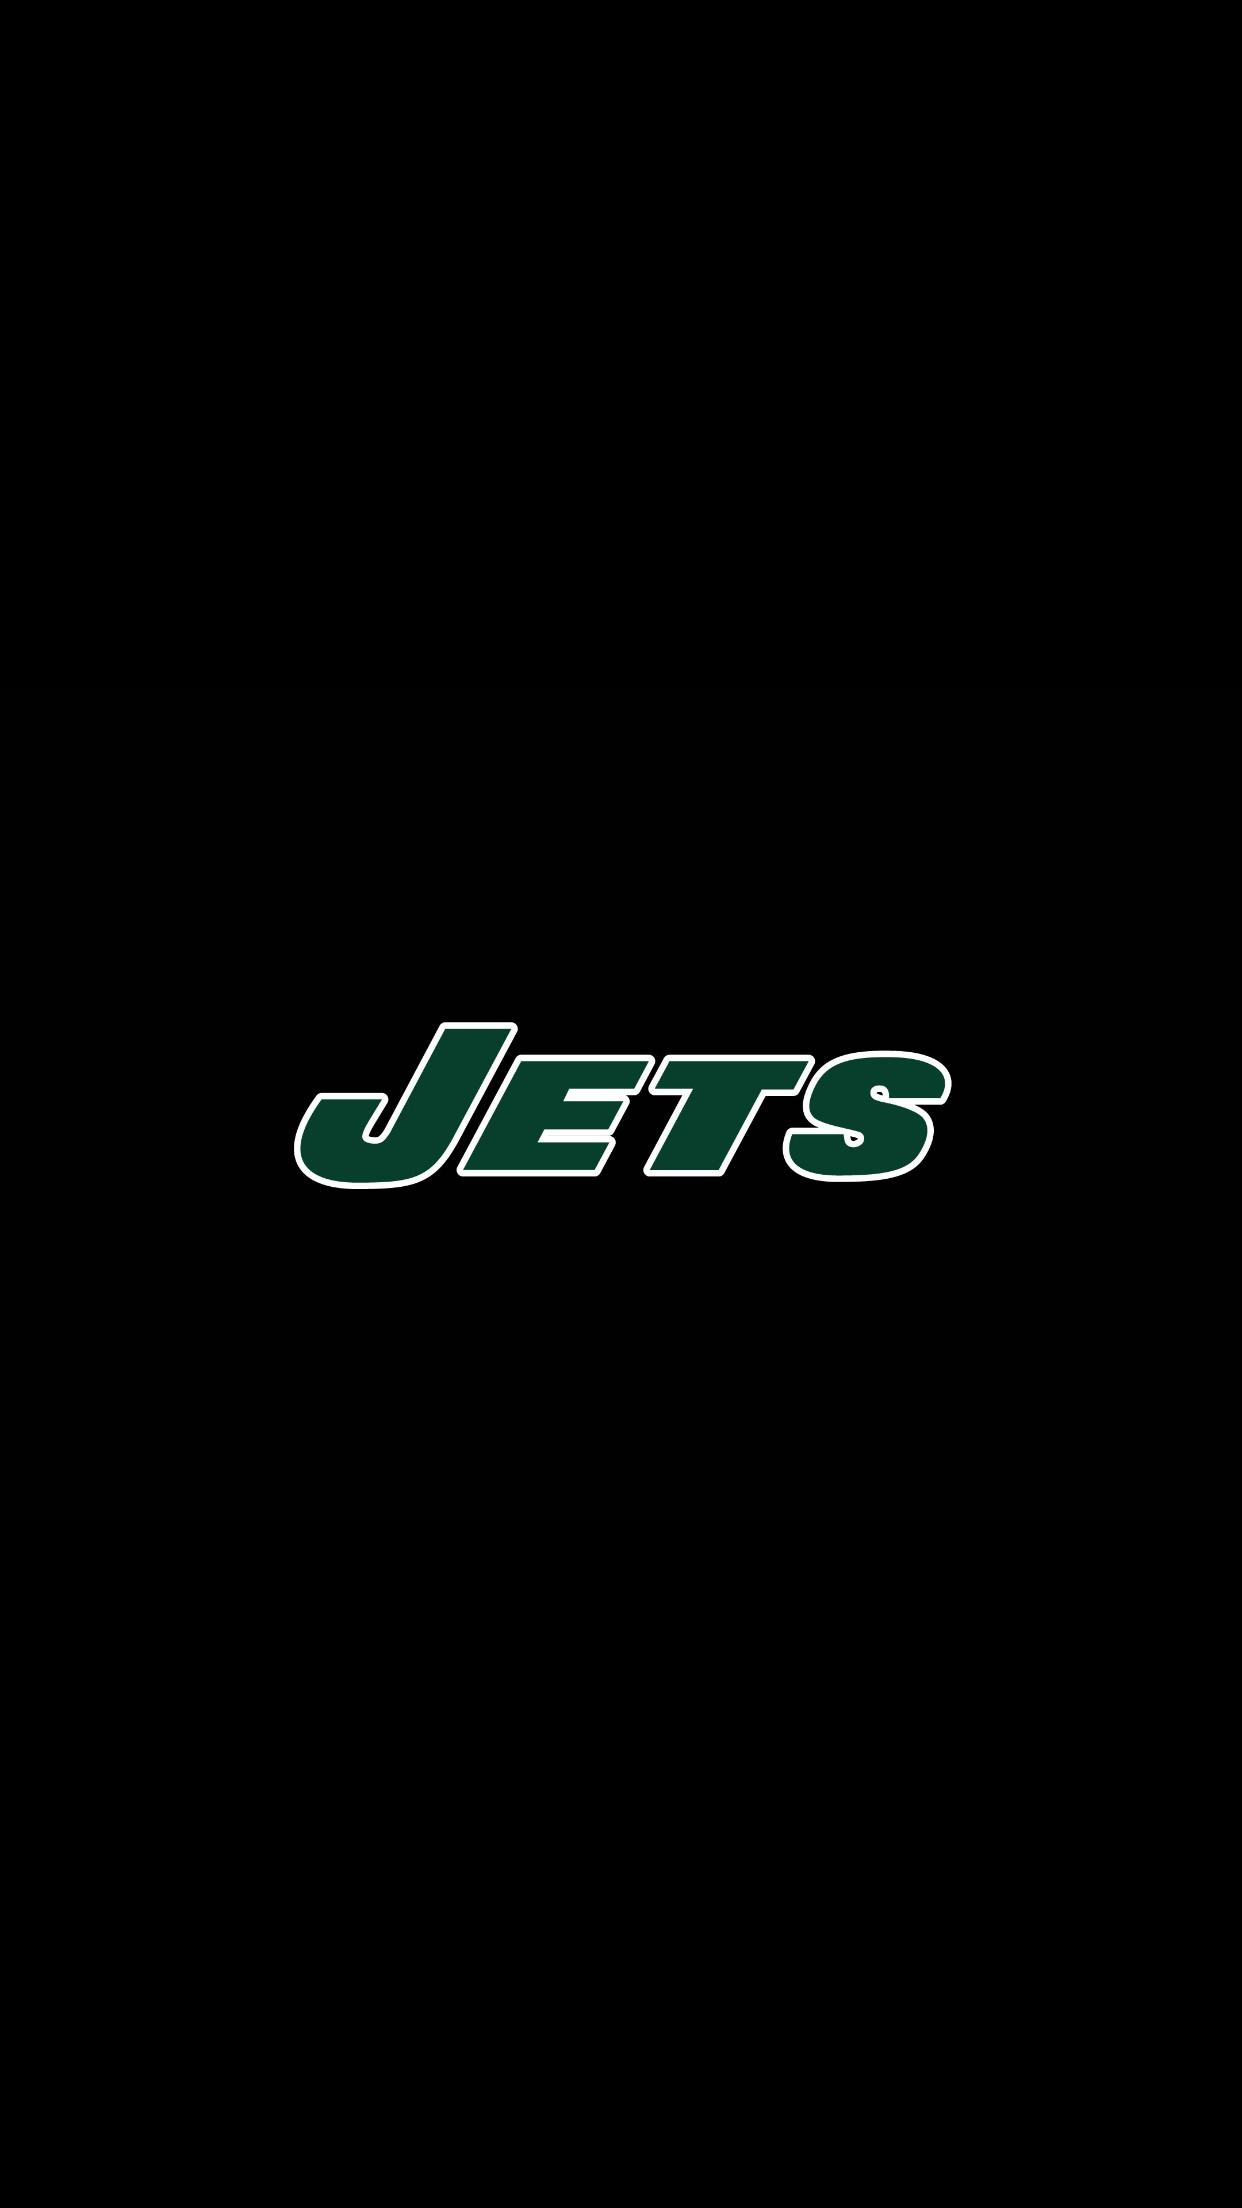 Pin By Nick Federico On New York Jets New York Jets Ny Jets